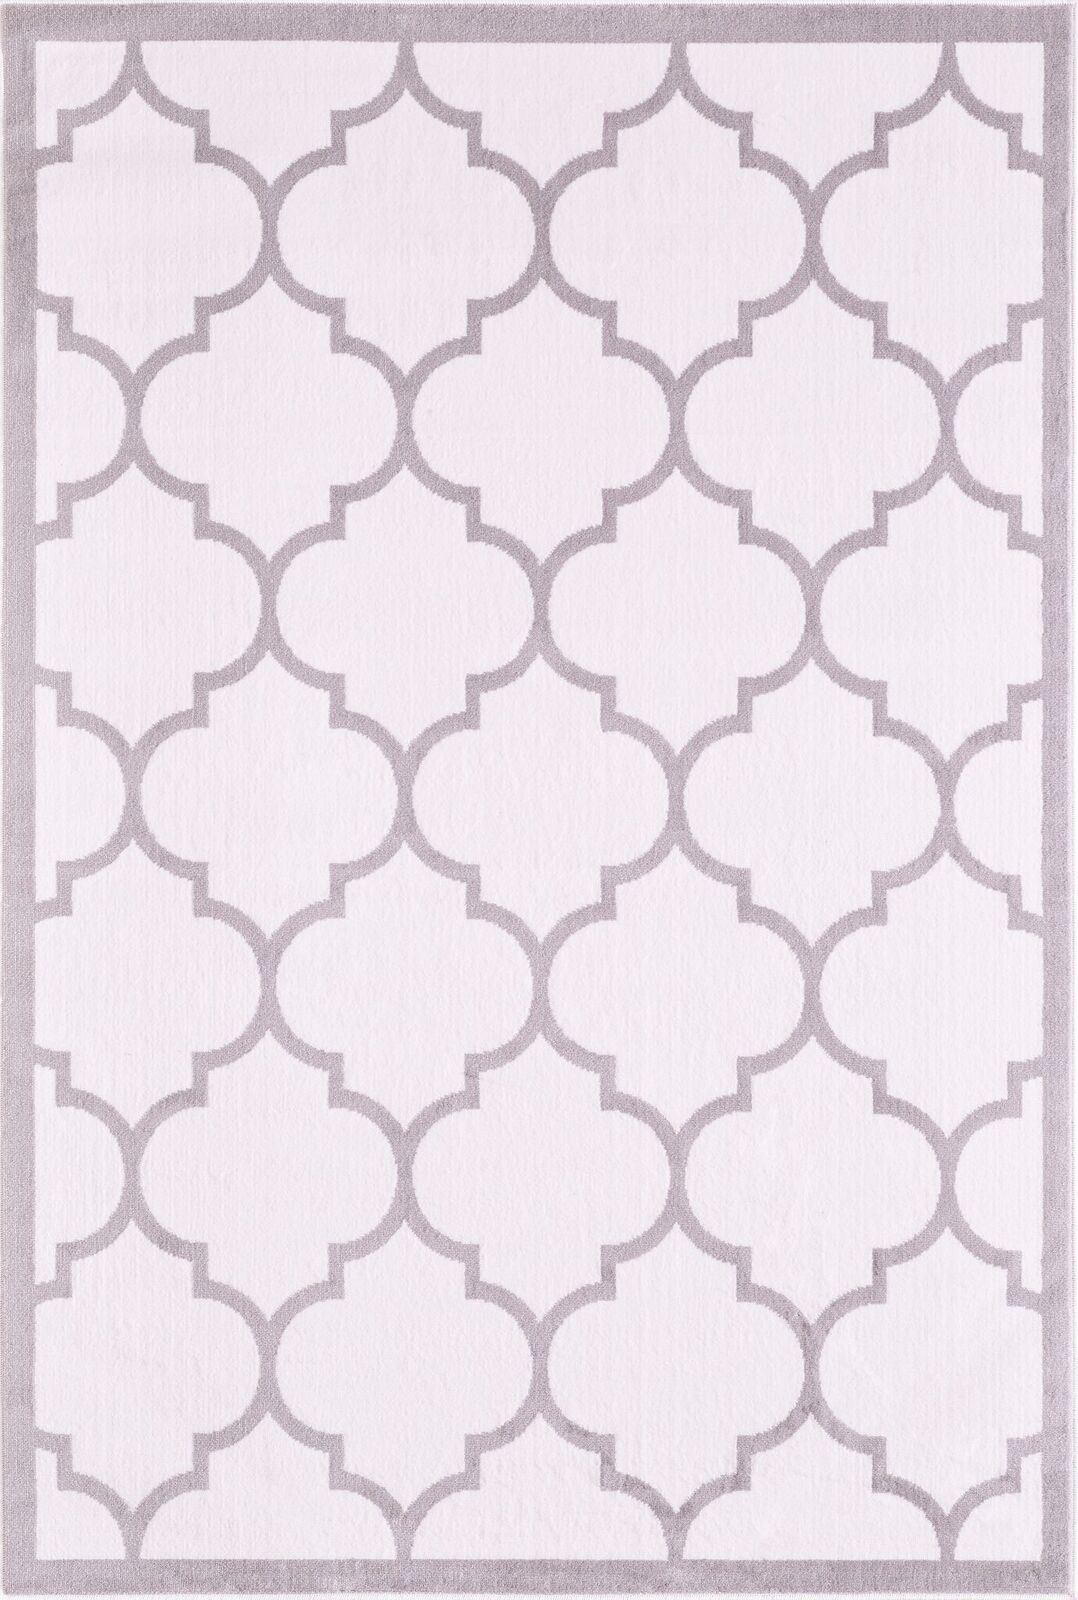 Large-Modern-Classic-Trellis-INDOOR-RUGS-Coloured-Floor-Carpet-Outdoor-Rug-Mats thumbnail 12